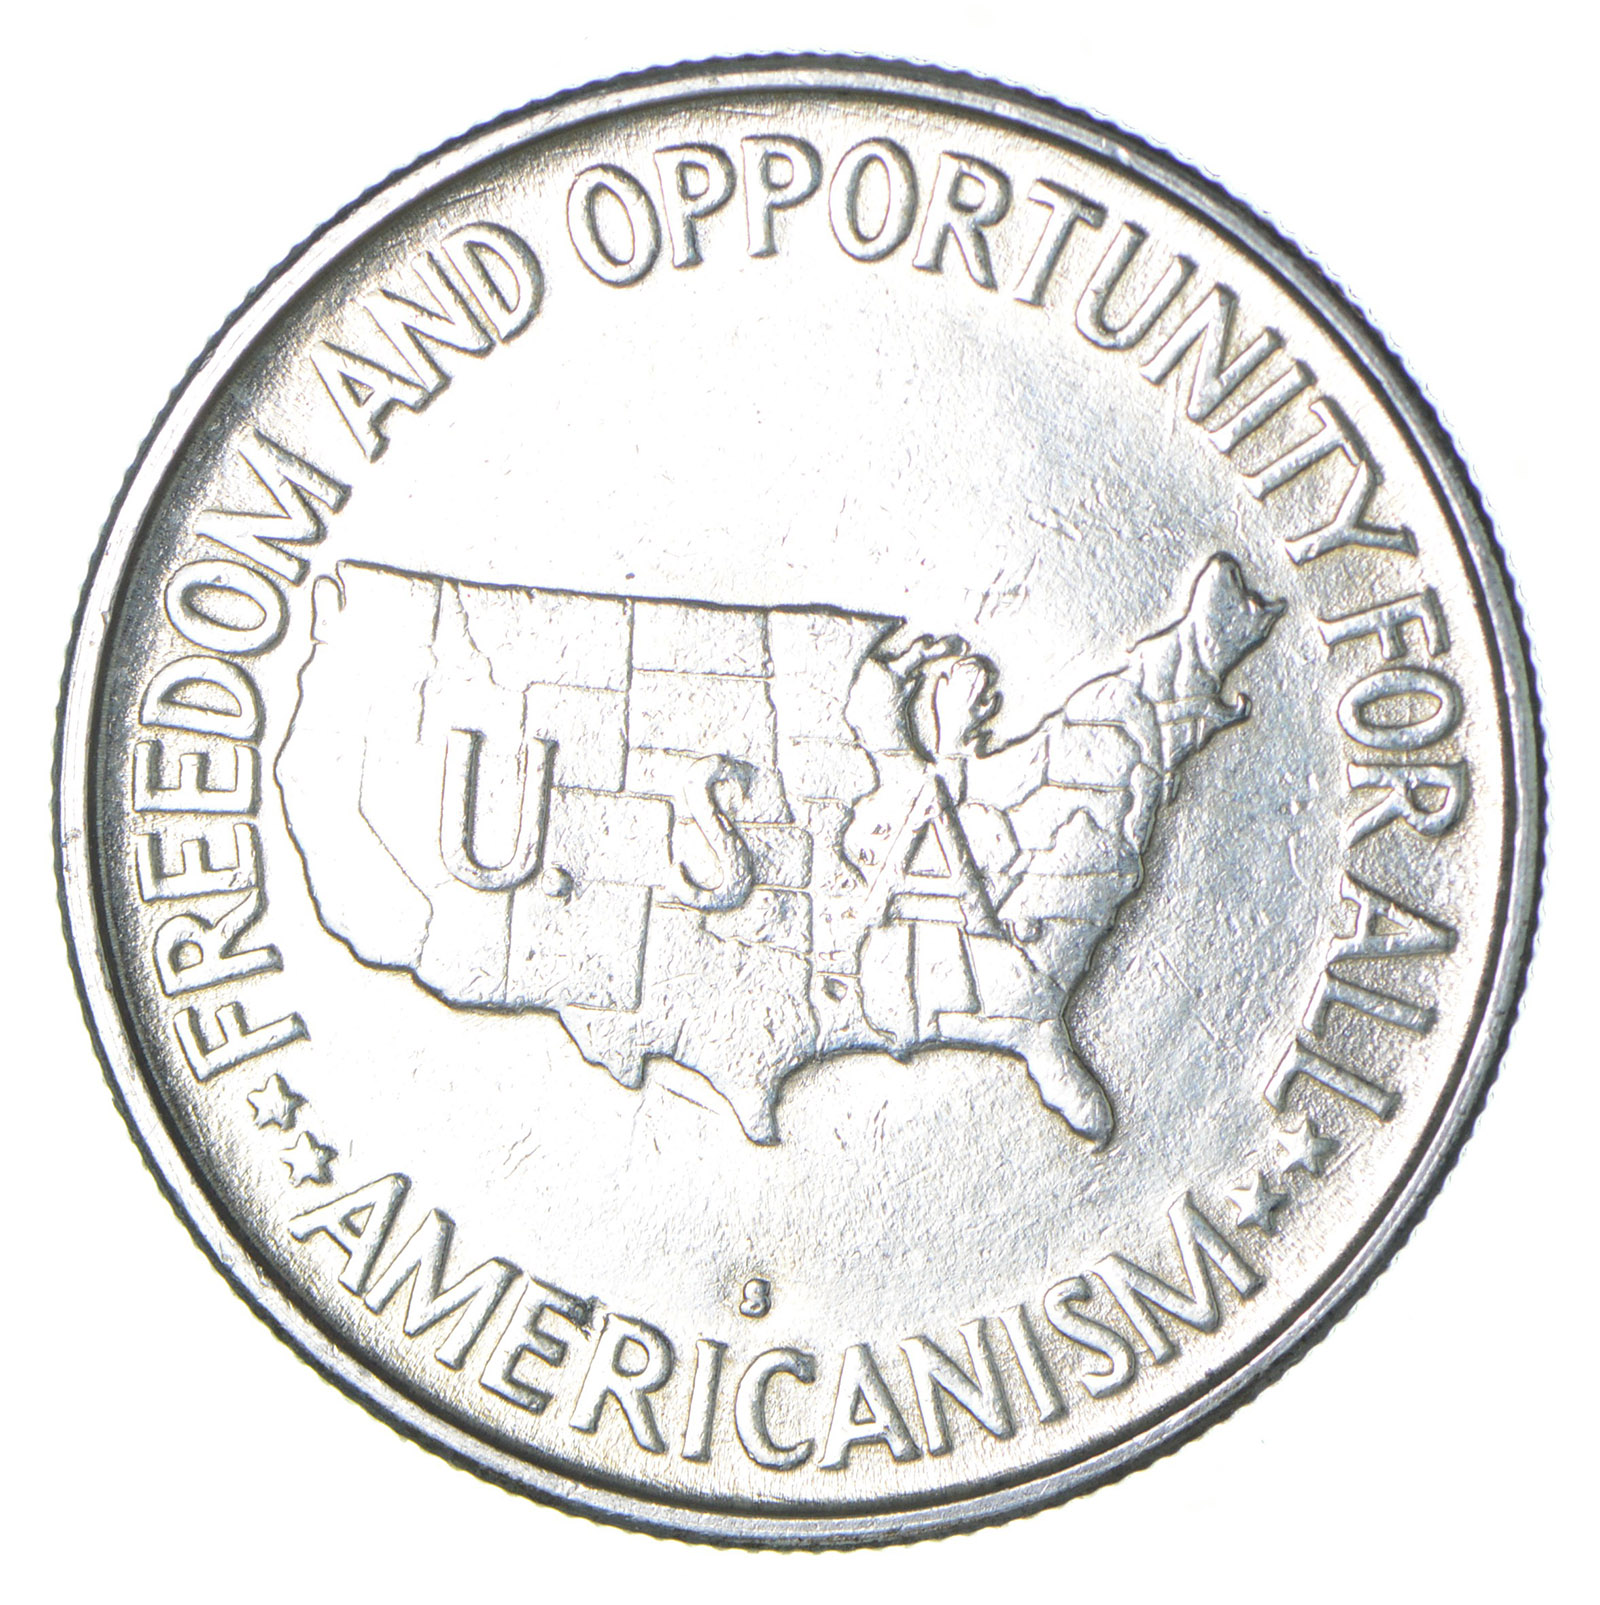 1953 ge e carver freedom opportunity us memorative half Silver Half Dollars 1953 ge e carver freedom opportunity us memorative half dollar